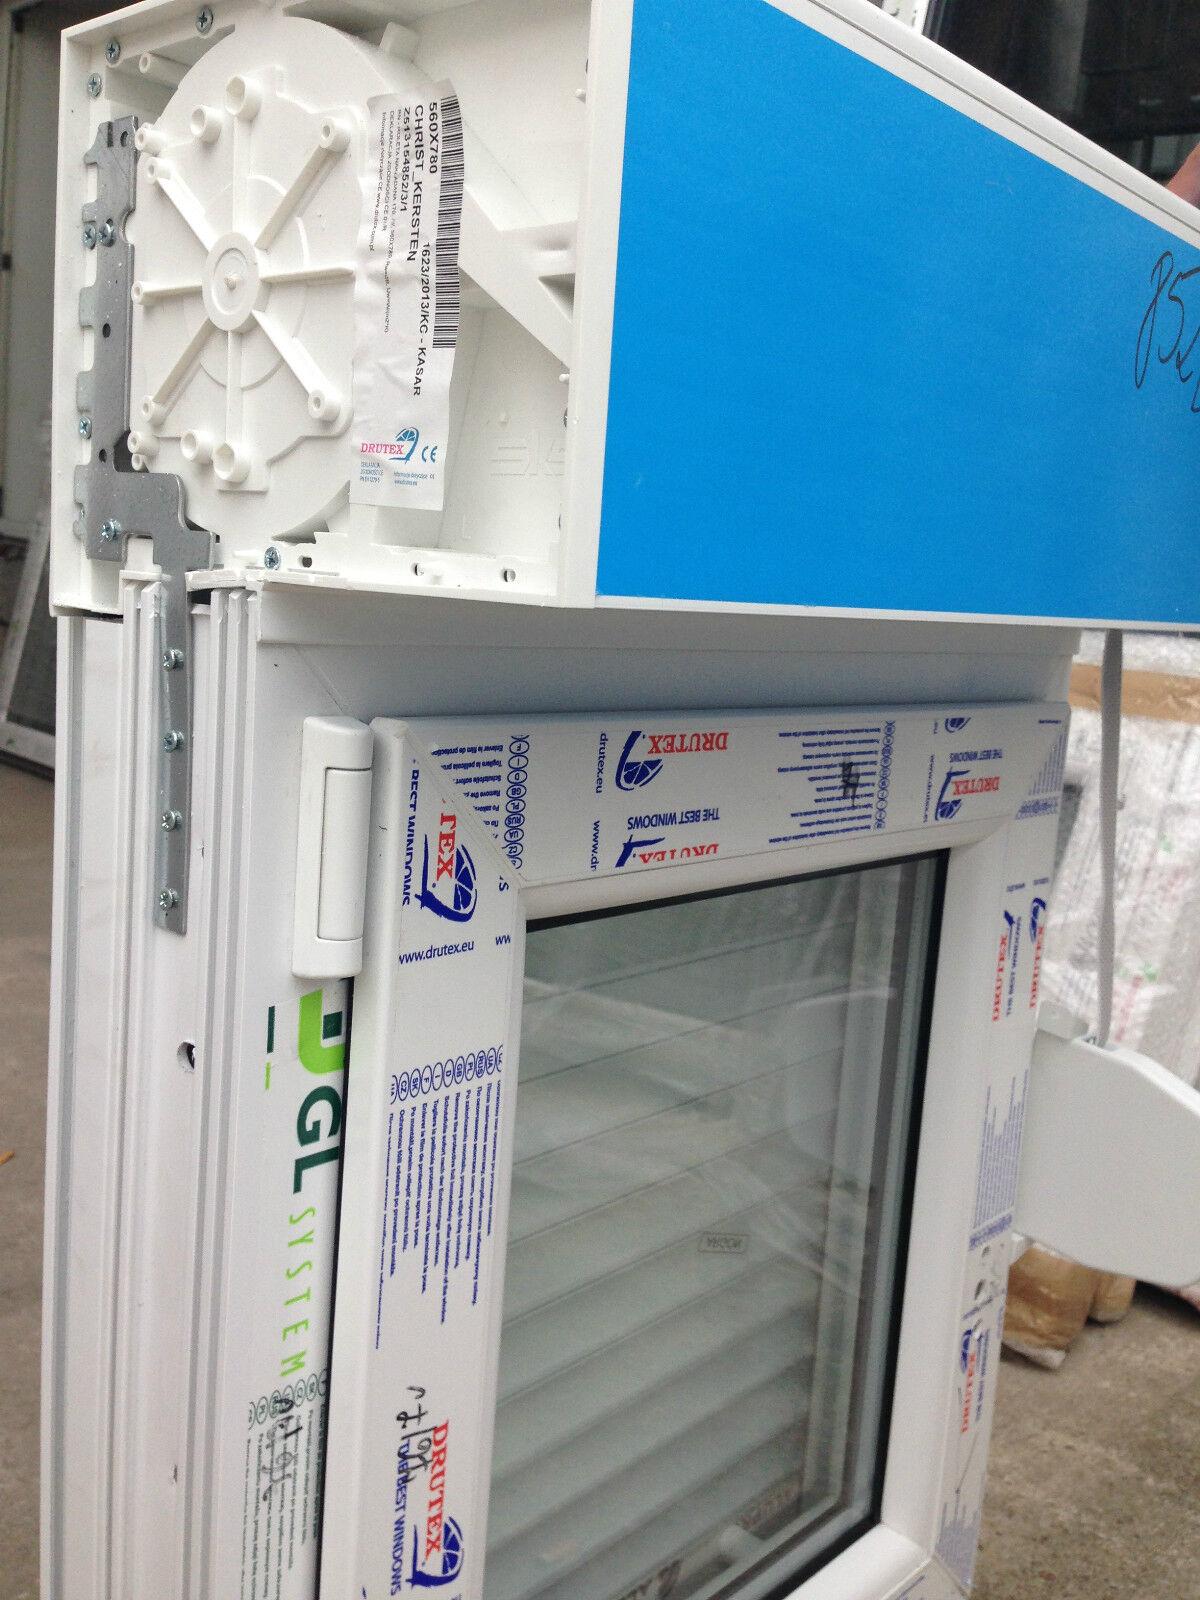 Fenster 1000 mm  Dreifachverglasung mit Elektromotor  Kasten montiert Rollladen